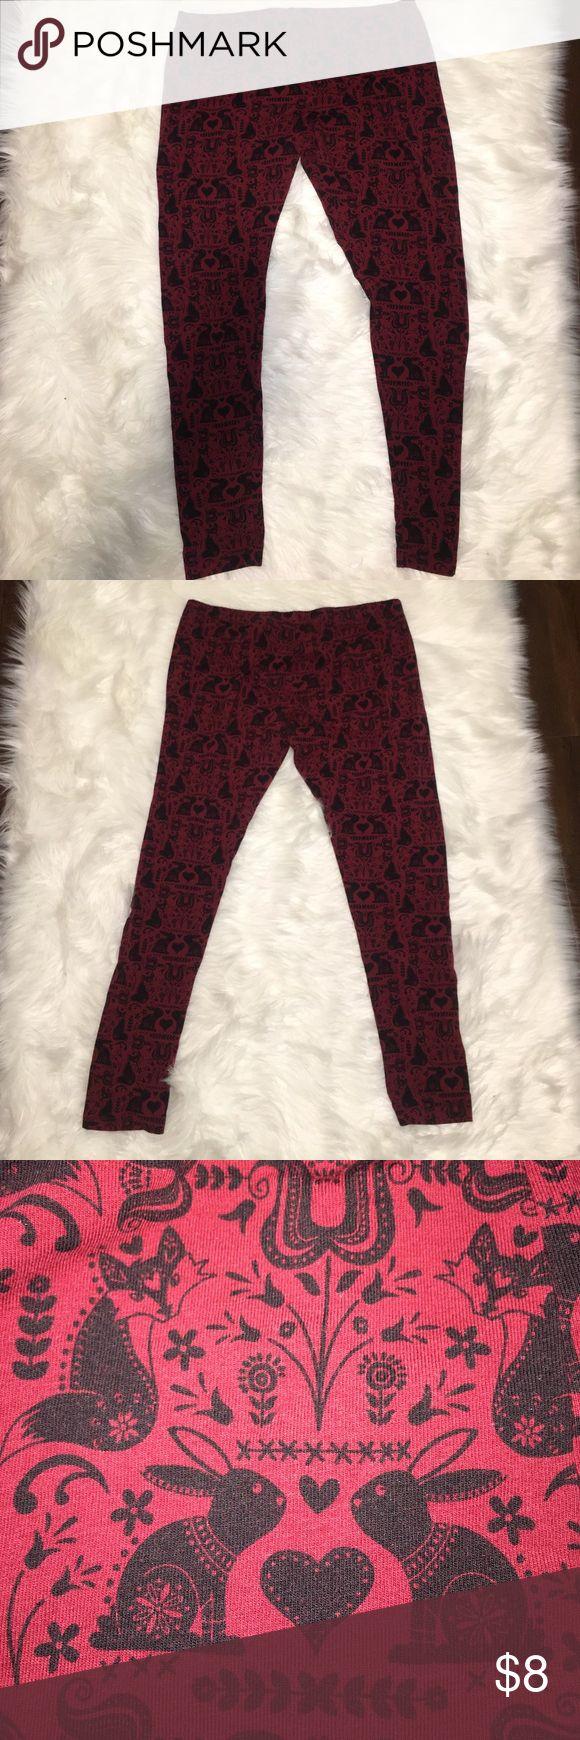 Mossimo Rabbit & Heart Print burgundy leggings XXL Mossimo Black Rabbit and Heart Print burgundy leggings size XXL Mossimo Supply Co Pants Leggings